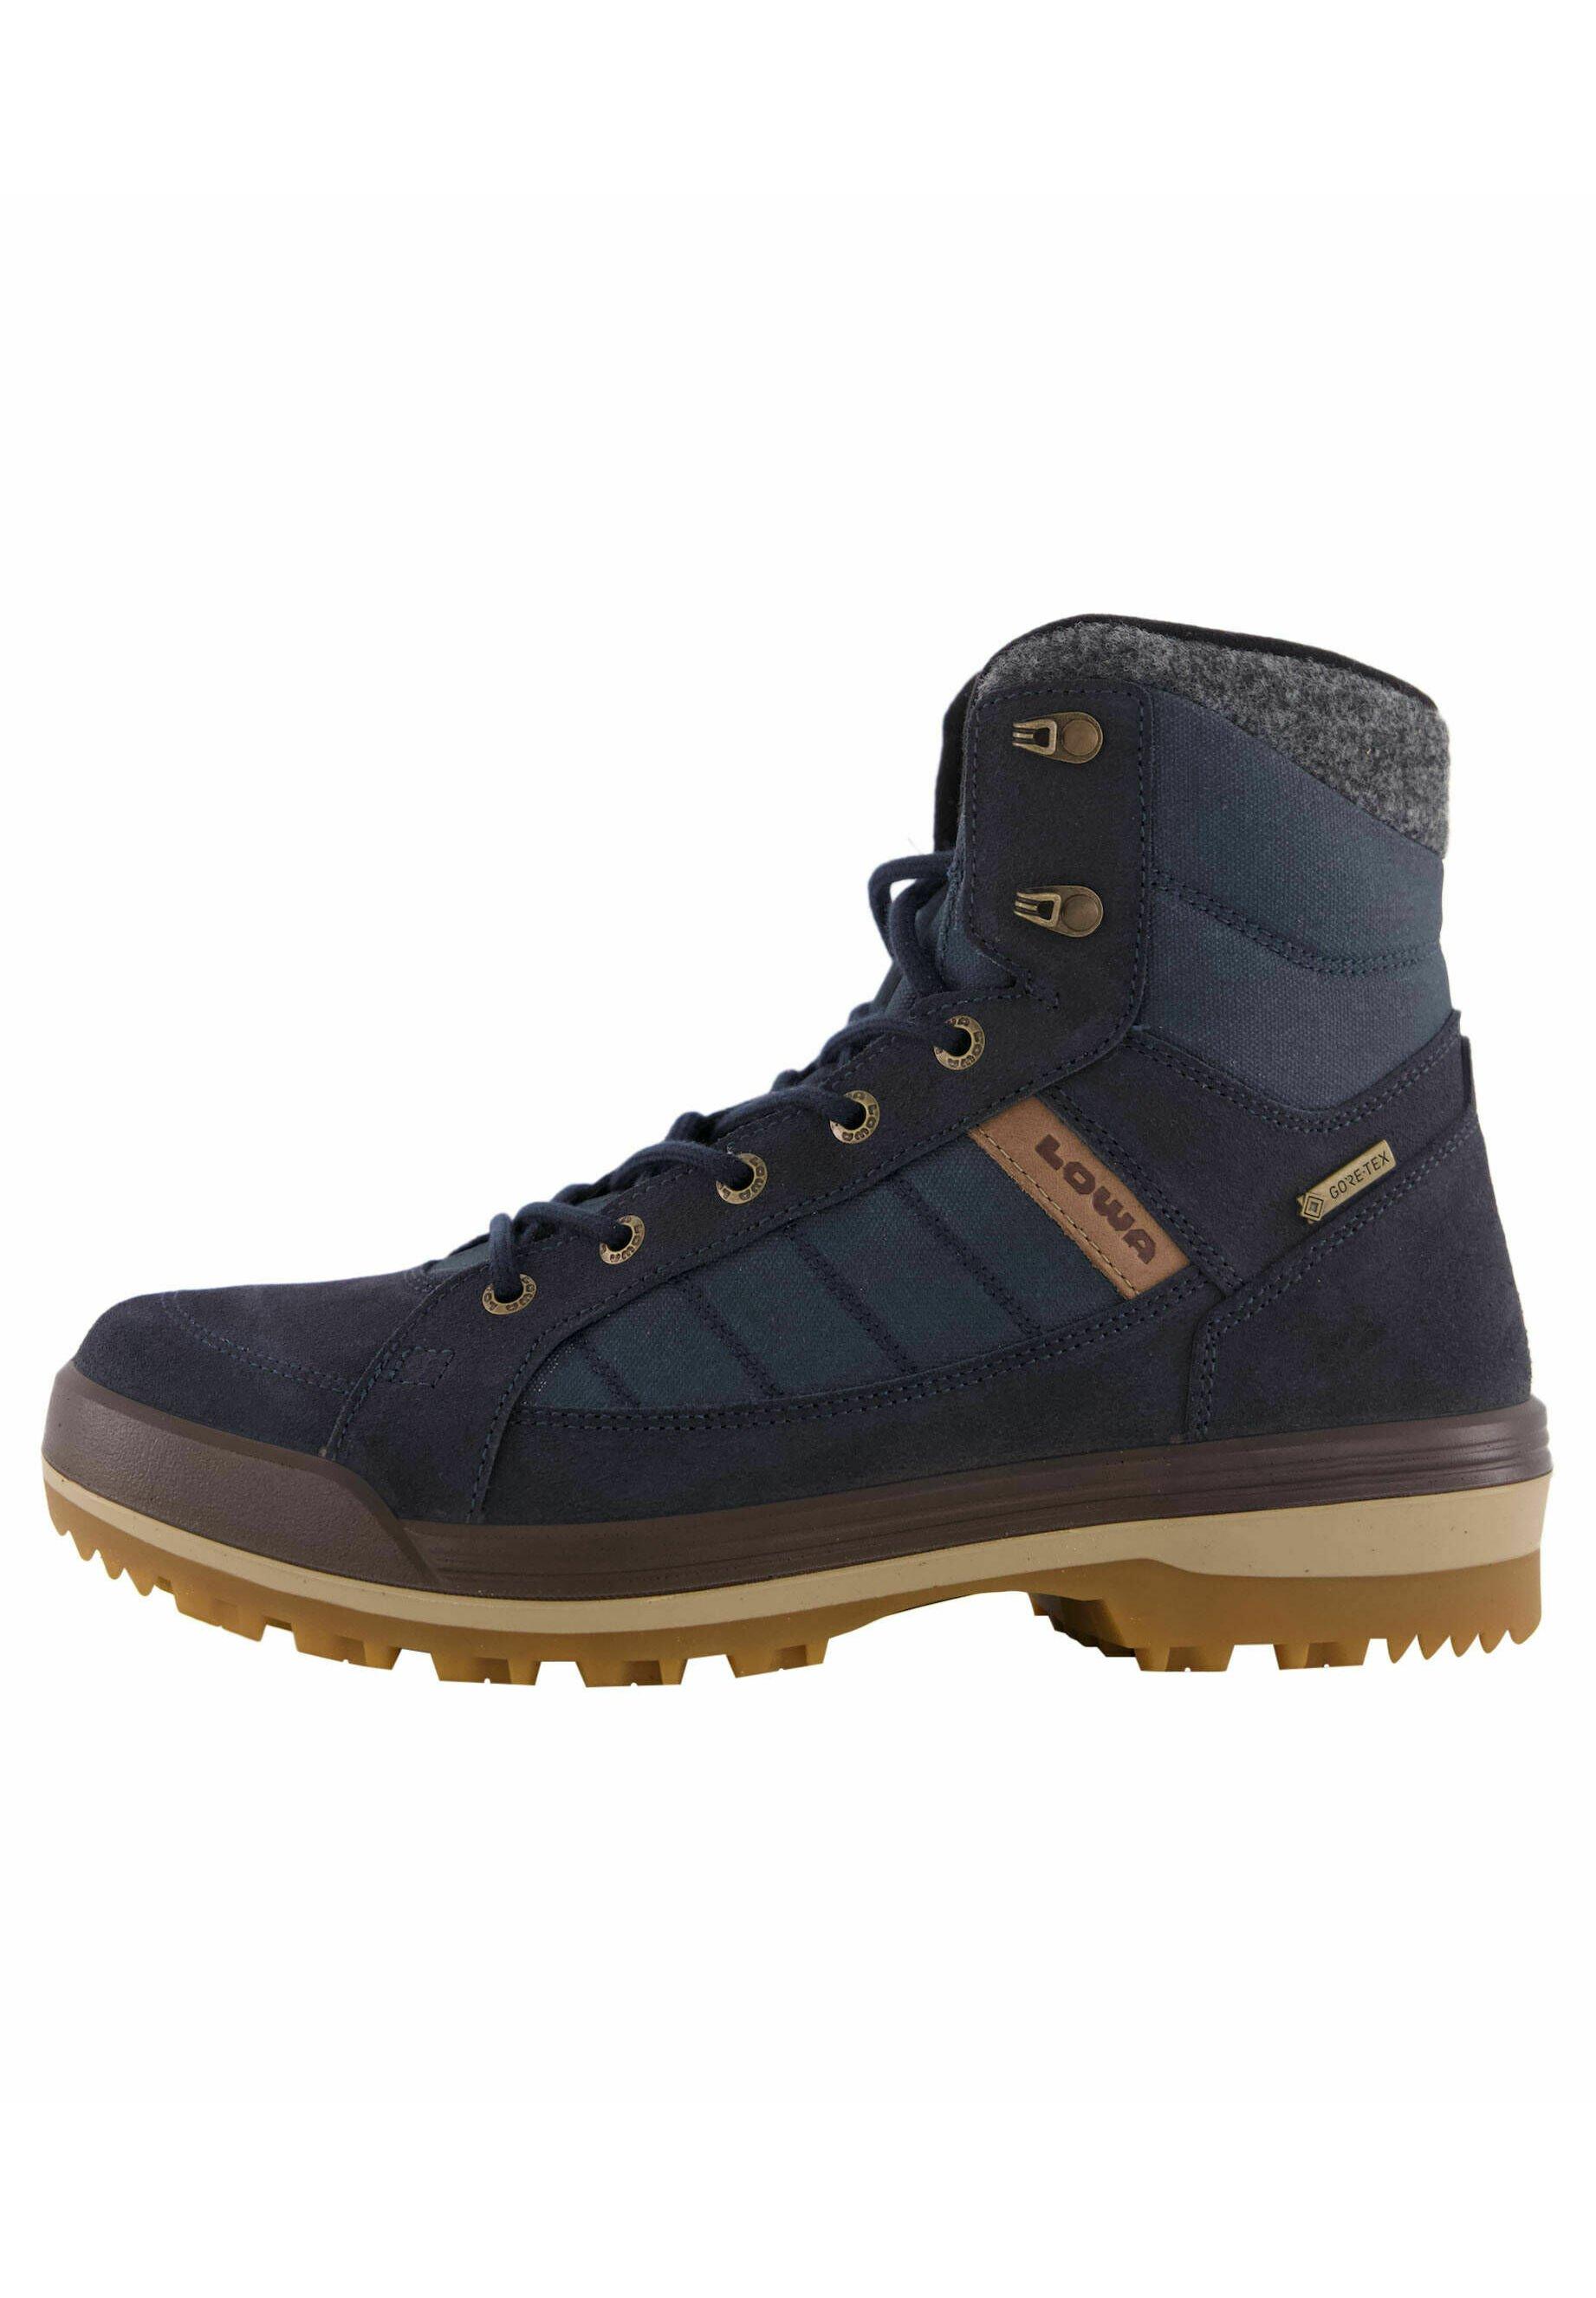 Uomo ISARCO EVO GTX® MID  - Scarpa da hiking